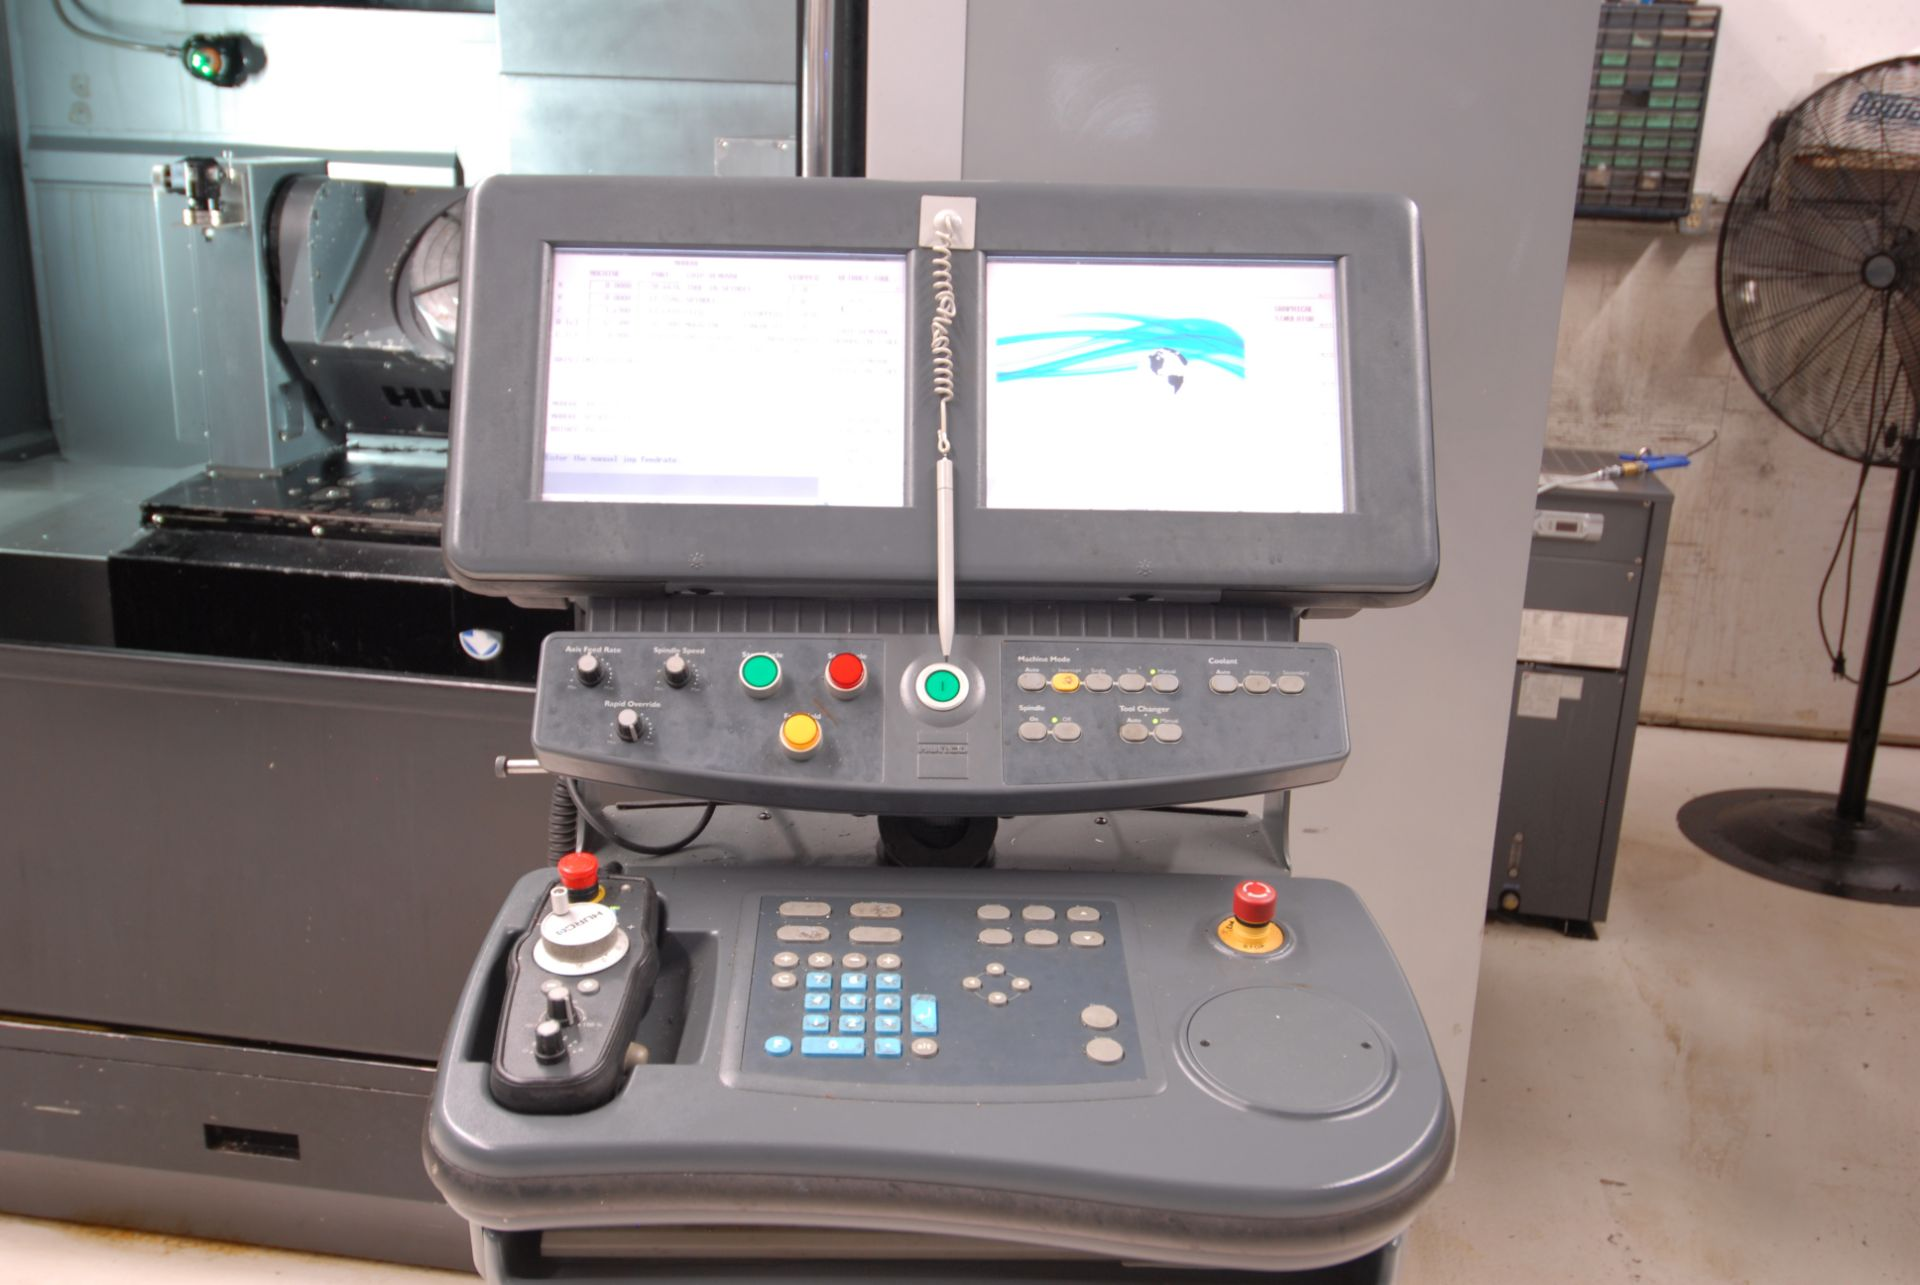 HURCO (2012) VMX42UI 5 AXIS CNC VERTICAL MACHINING CENTER WITH HURCO DUAL SCREEN CNC CONTROL, 13. - Image 3 of 20